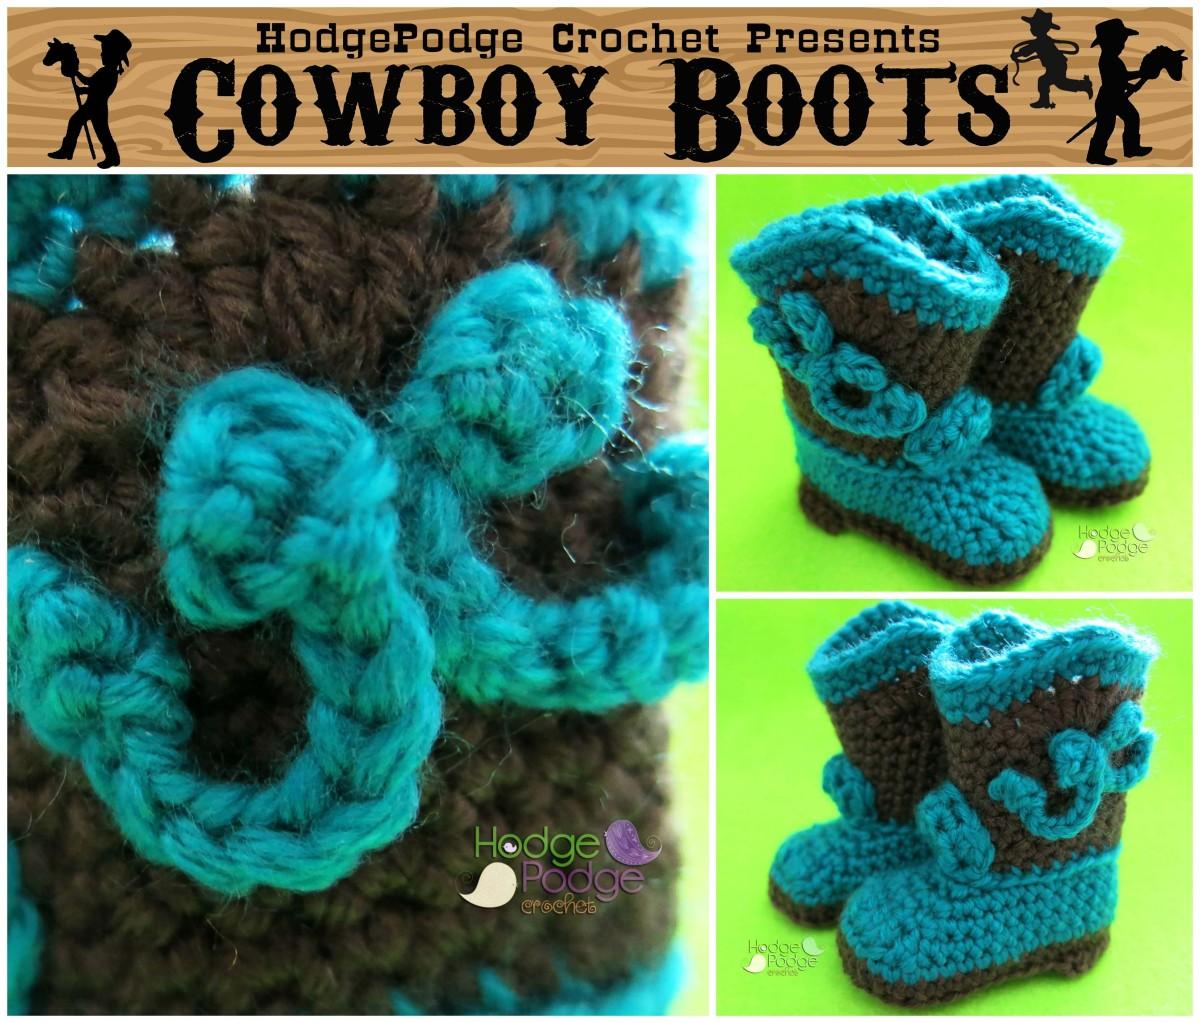 Cowboy Boots | HodgePodge Crochet